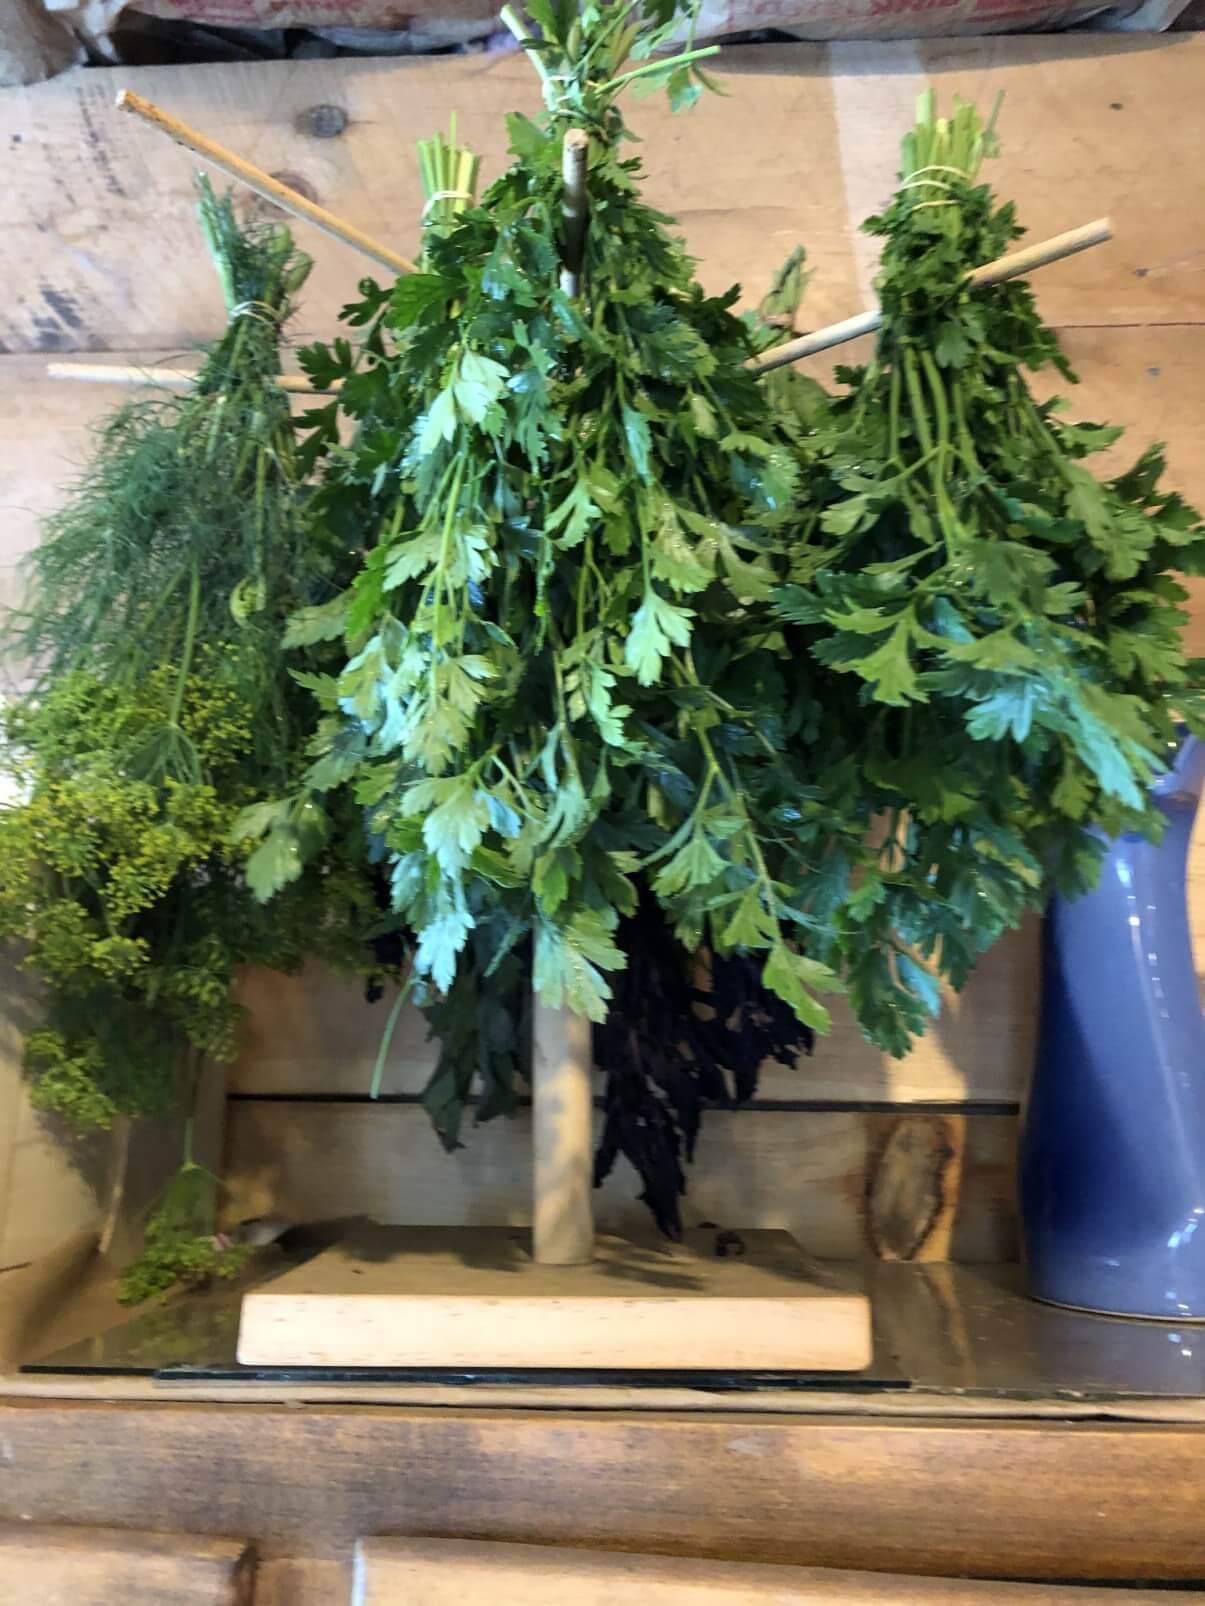 fresh herbs bundled and drying on pasta rack